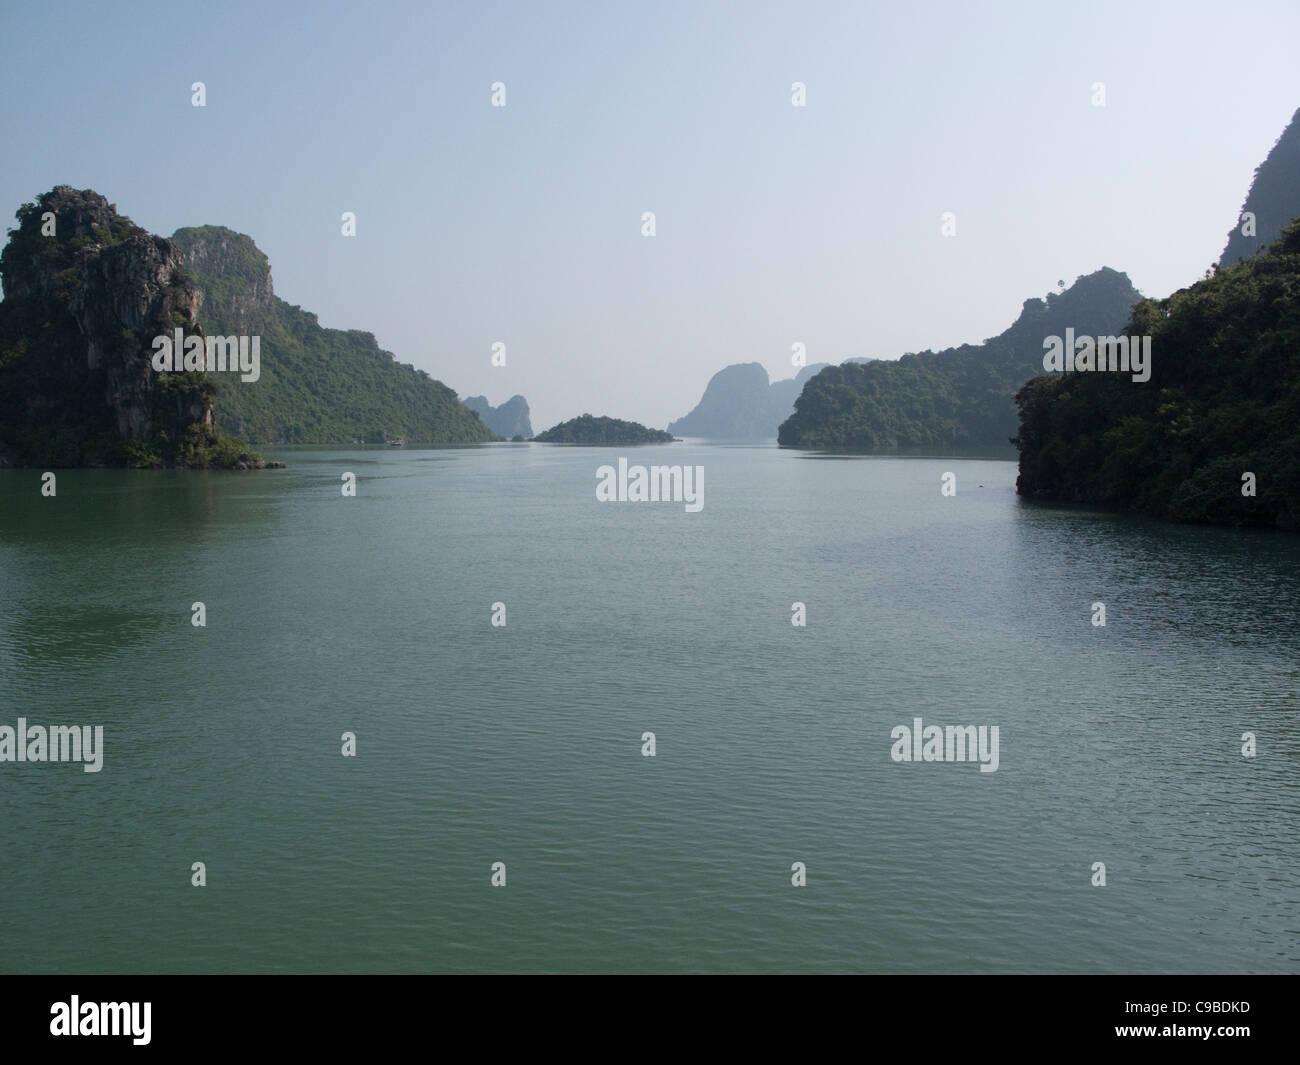 Rock formations in the South China Sea at Halong Bay, Vietnam - Stock Image